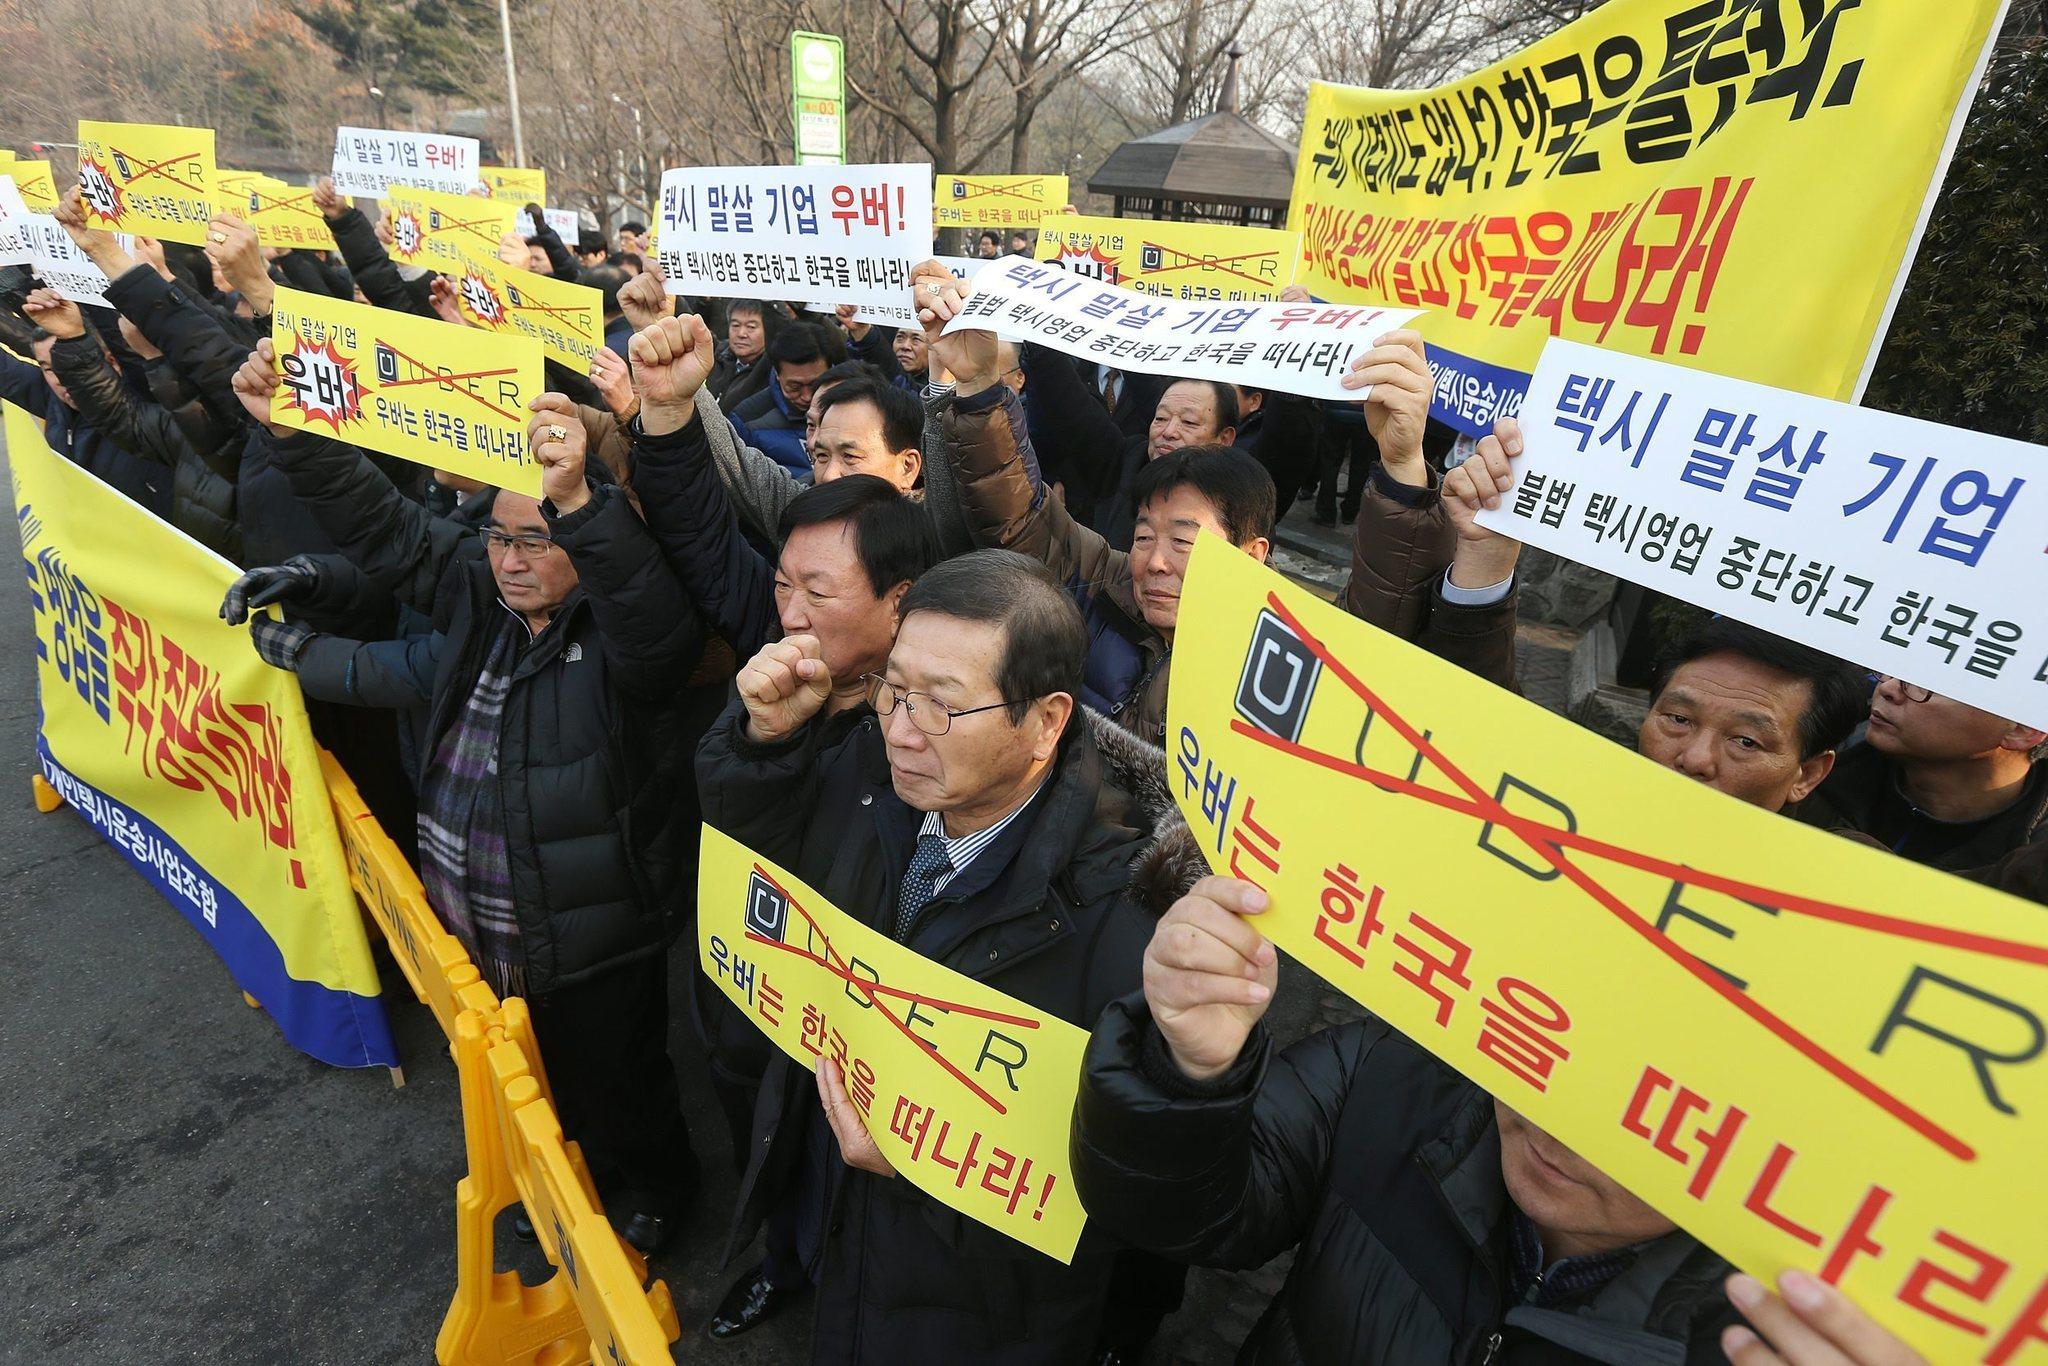 Uber suspends UberX in South Korea